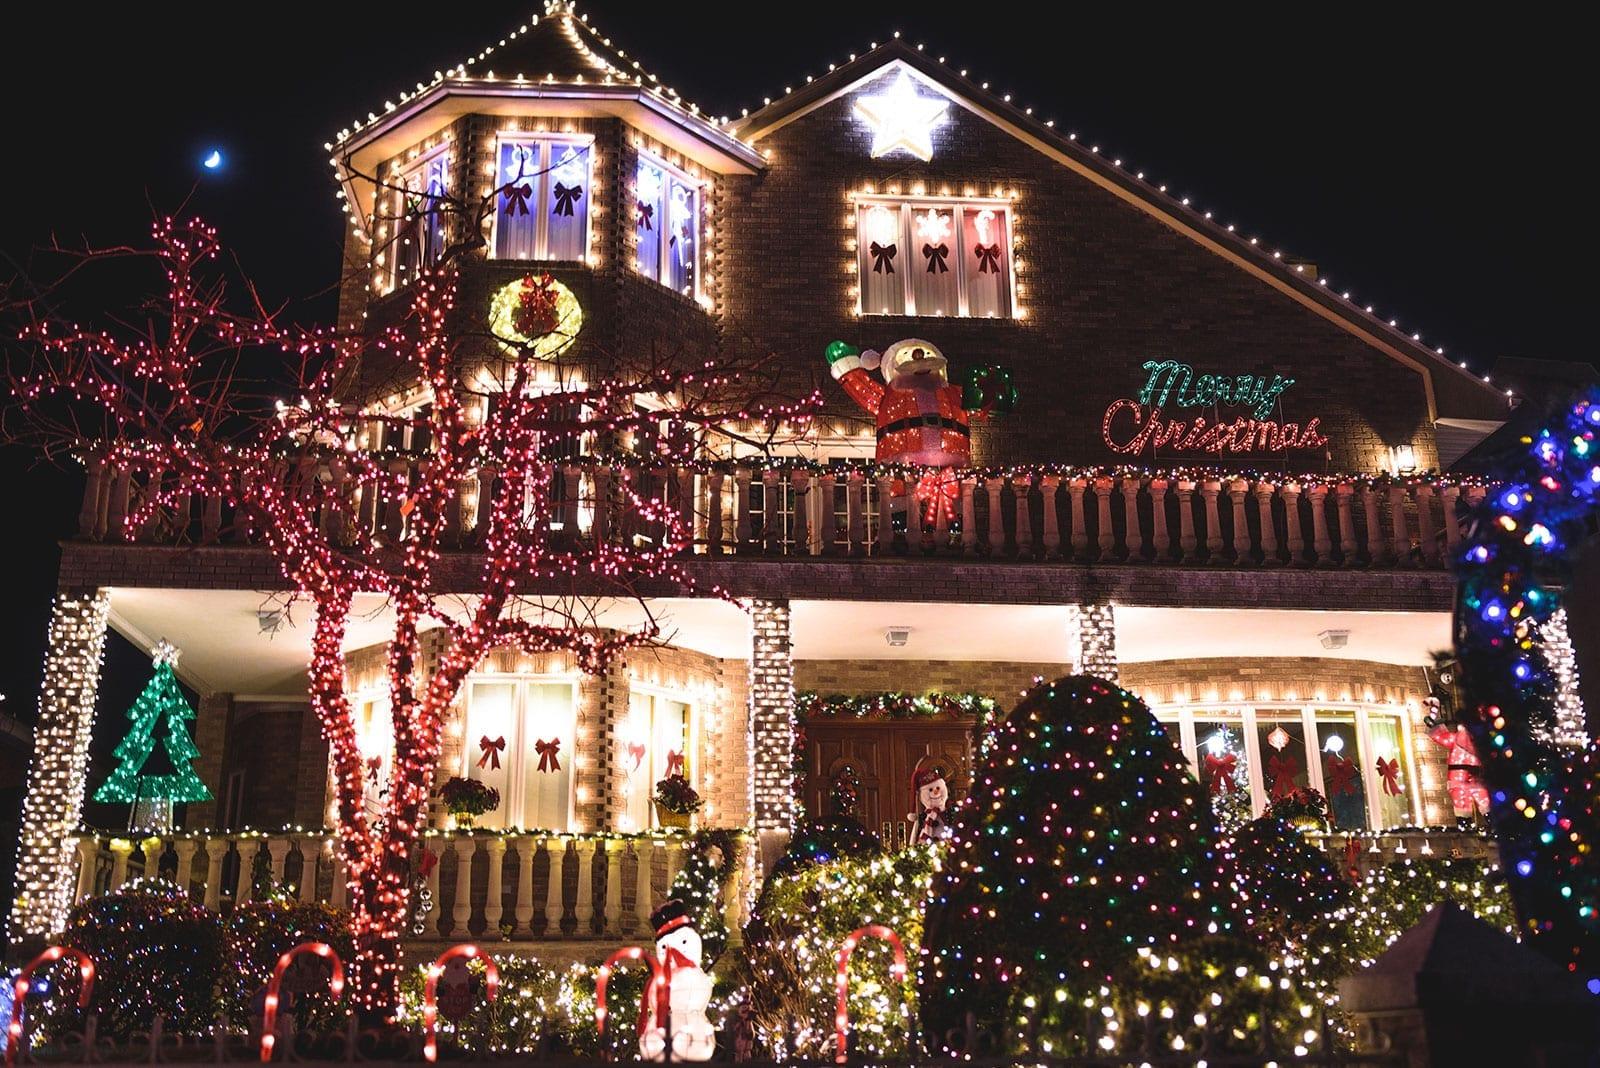 Dyker Heights Christmas Lights Tour 2020 The Dyker Heights Christmas Tour in Brooklyn   See The Best